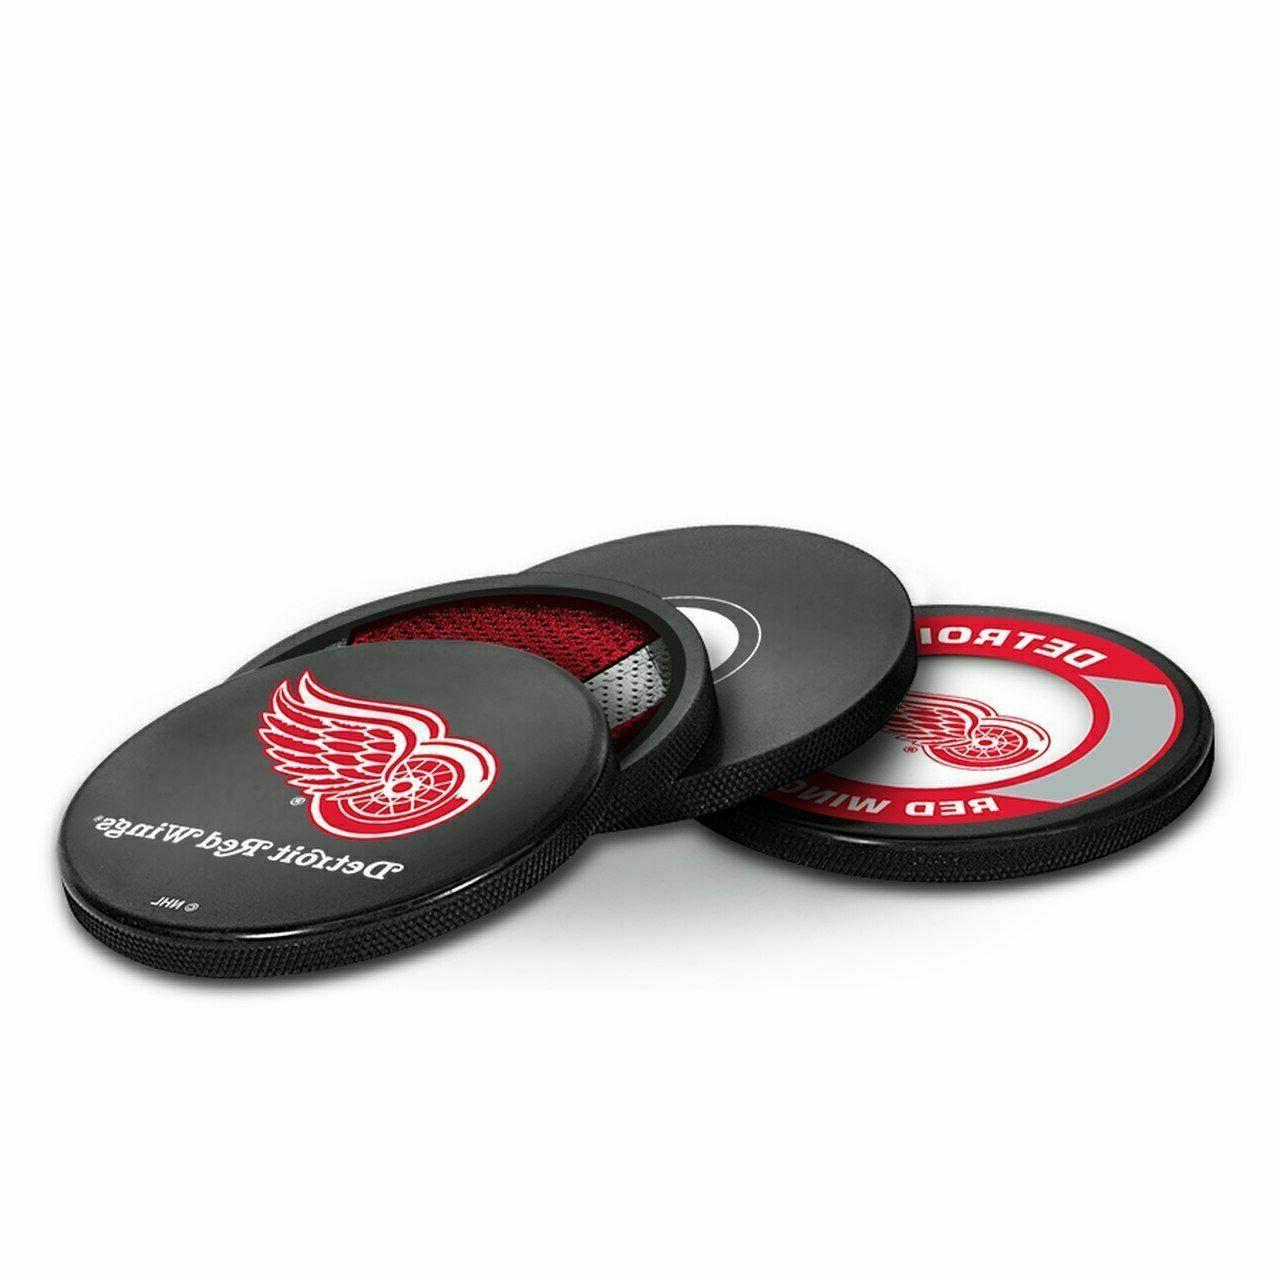 new nhl actual hockey puck coasters set